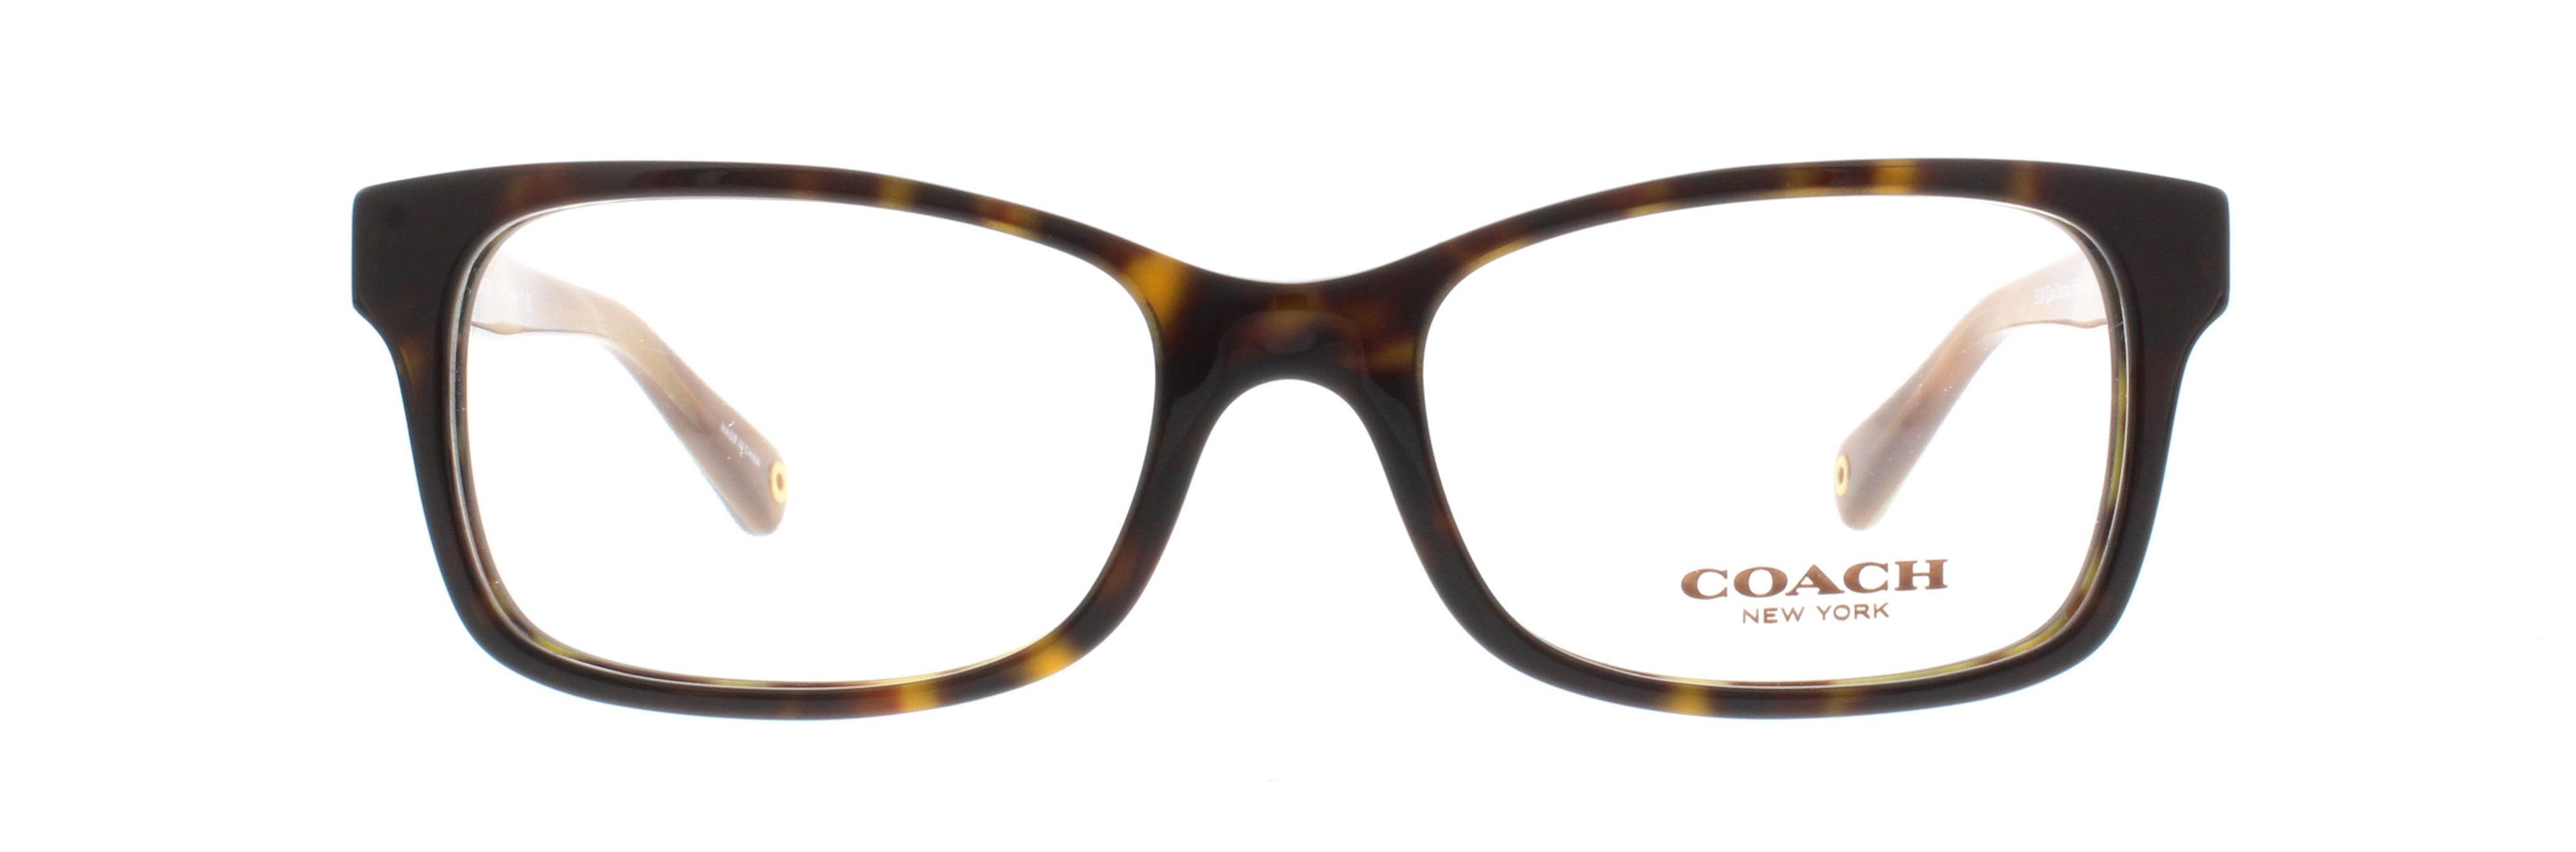 4721765ca5 COACH Eyeglasses HC 6047 5204 Dark Tortoise Brown Horn 49MM - Walmart.com